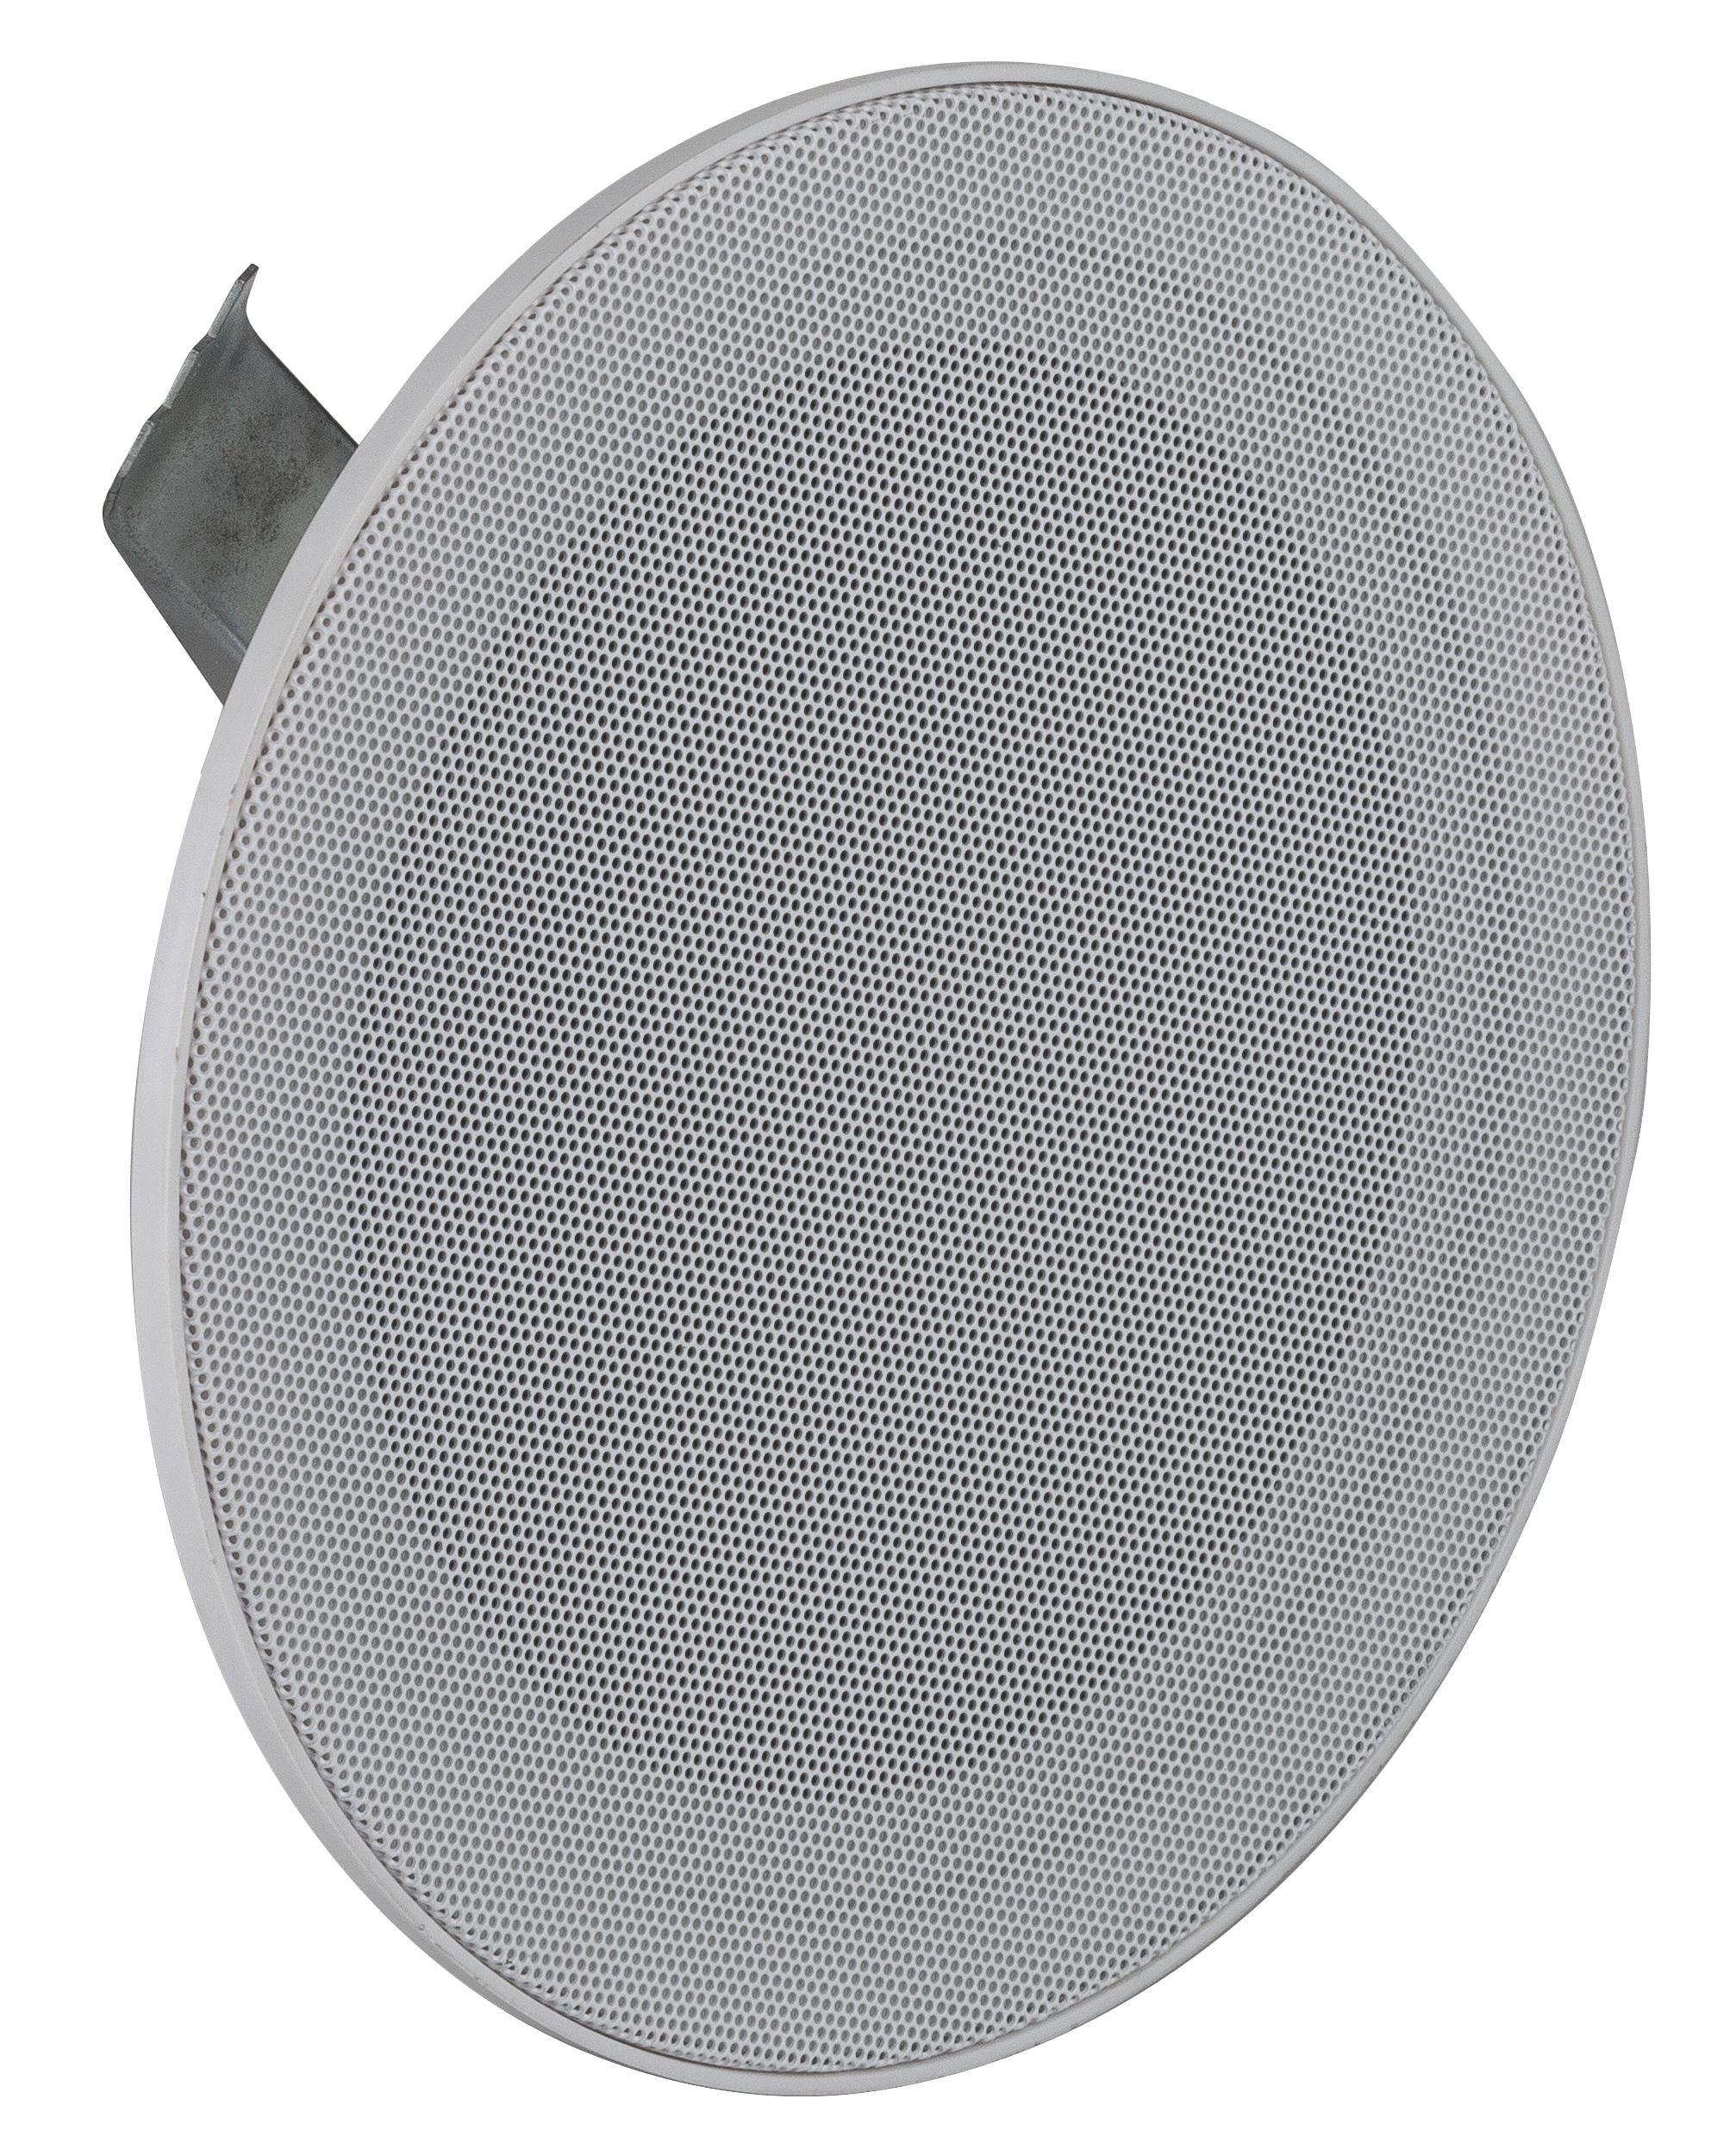 Dual cone ceiling speaker 5�Ǧ 6W / 100V